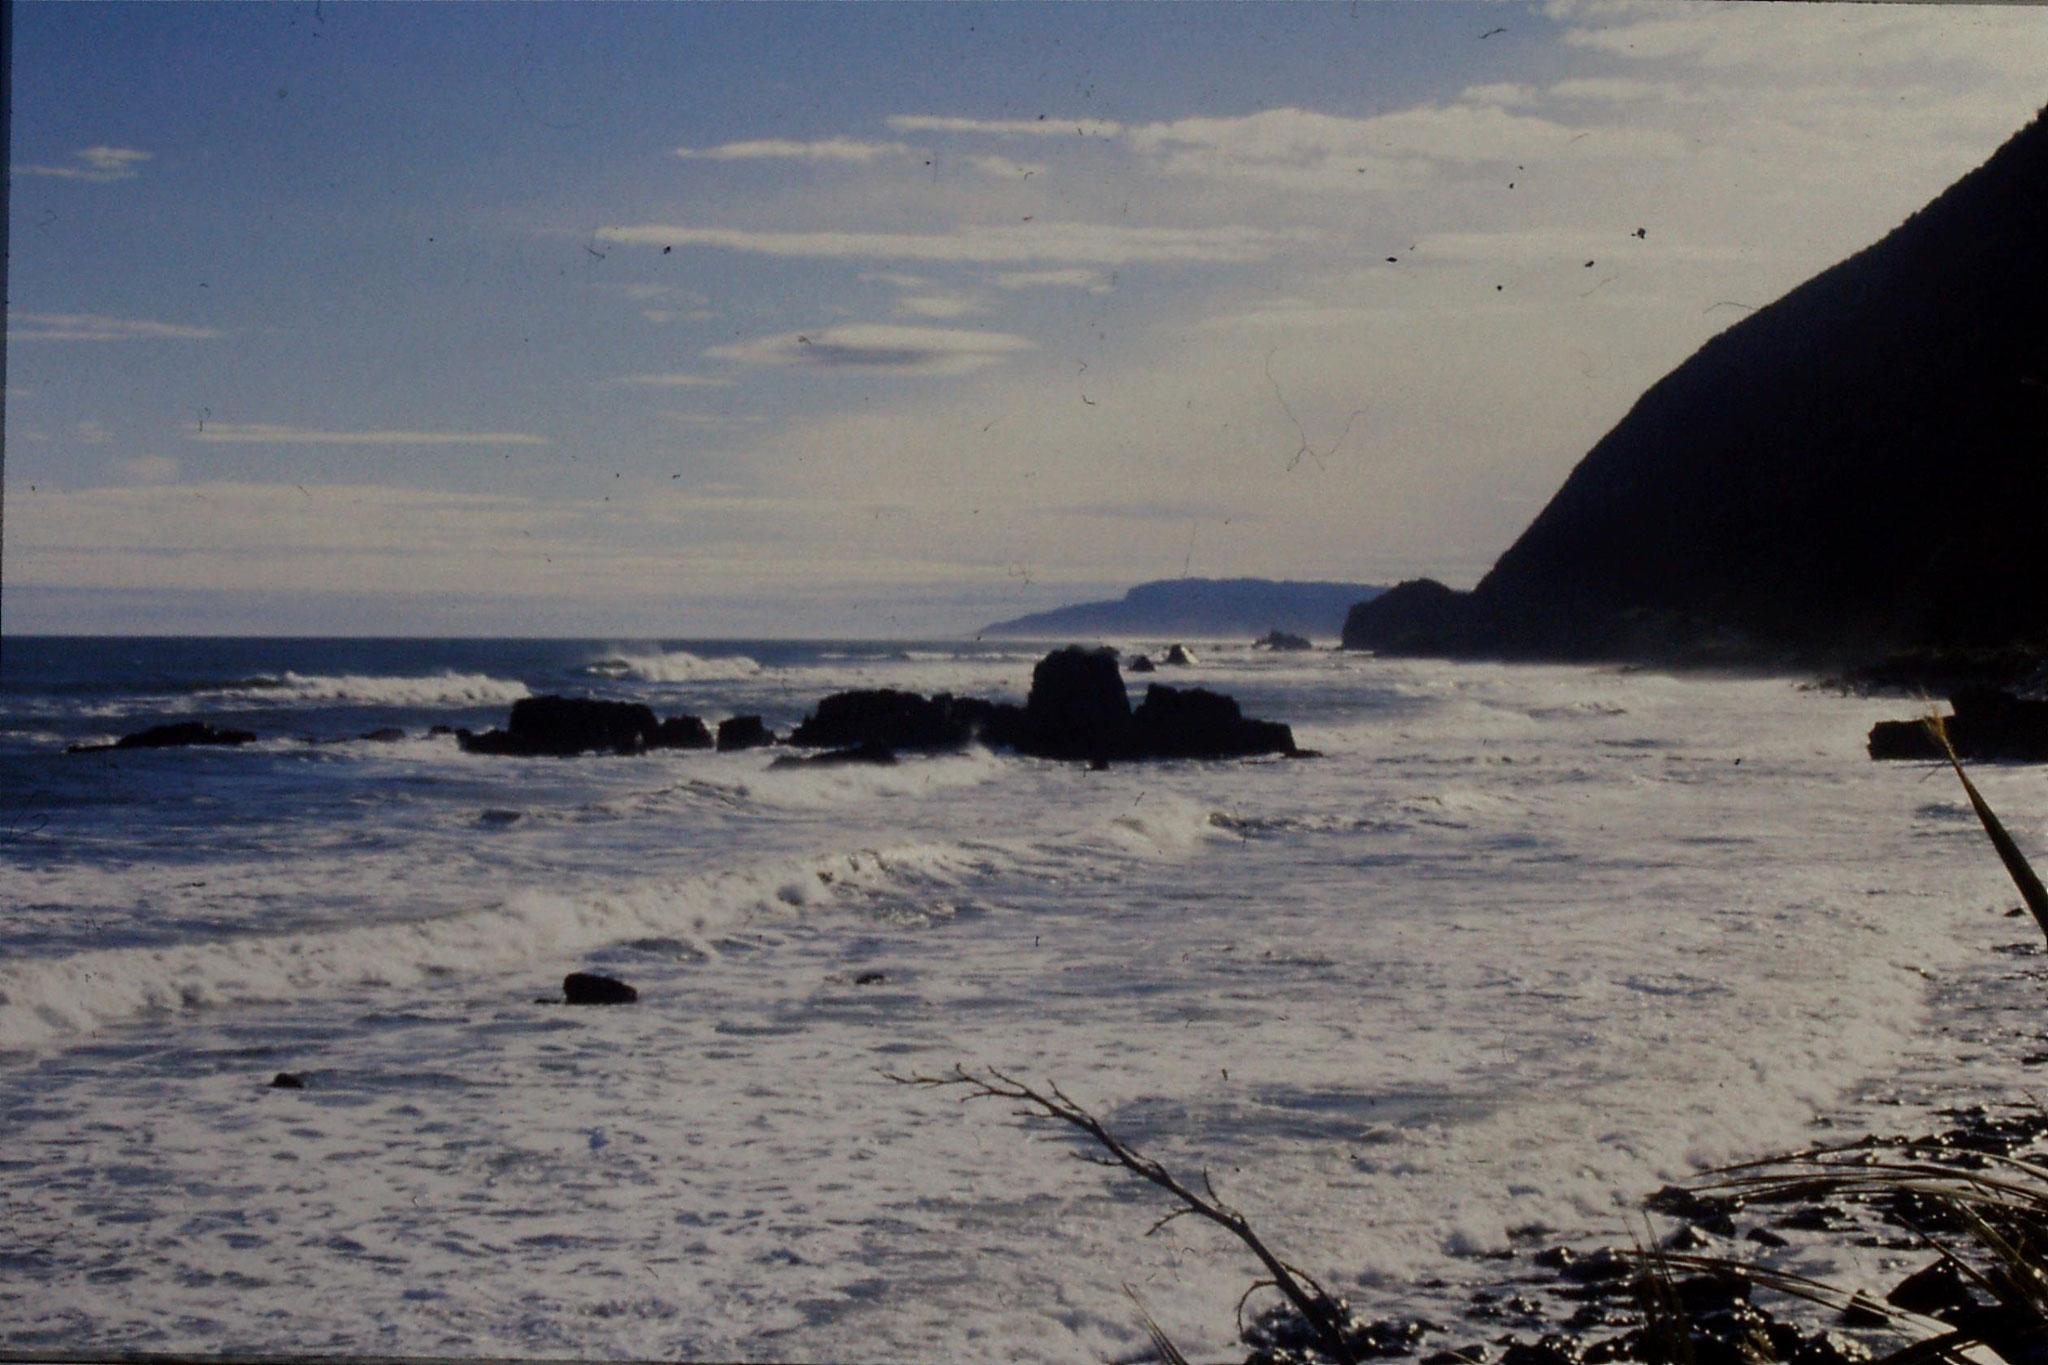 22/8/1990: 39: Motukiekie rocks